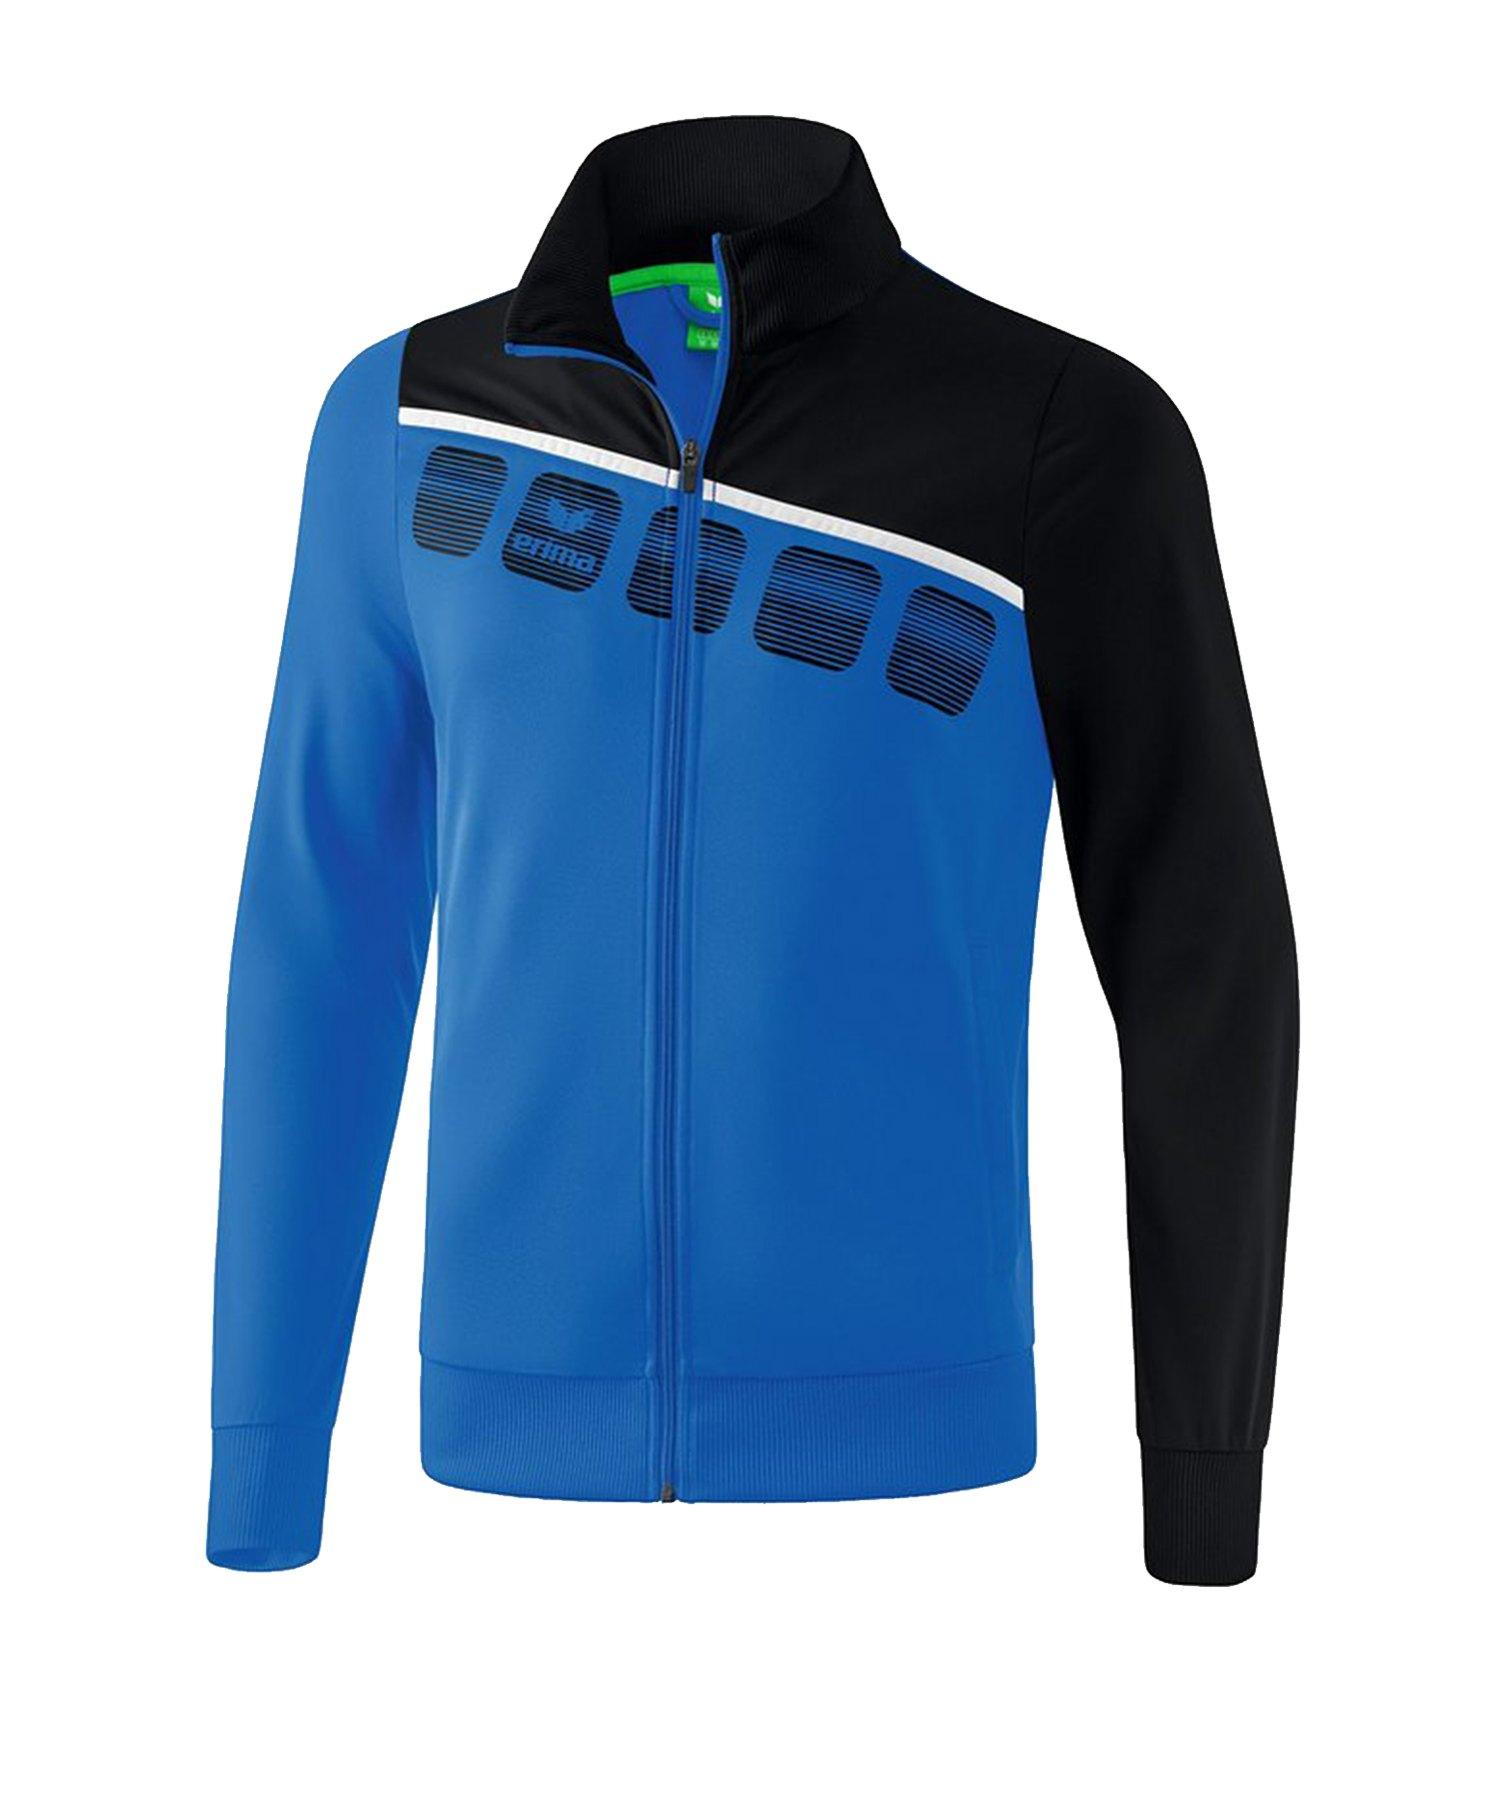 Erima 5-C Polyesterjacke Kids Blau Schwarz - Blau